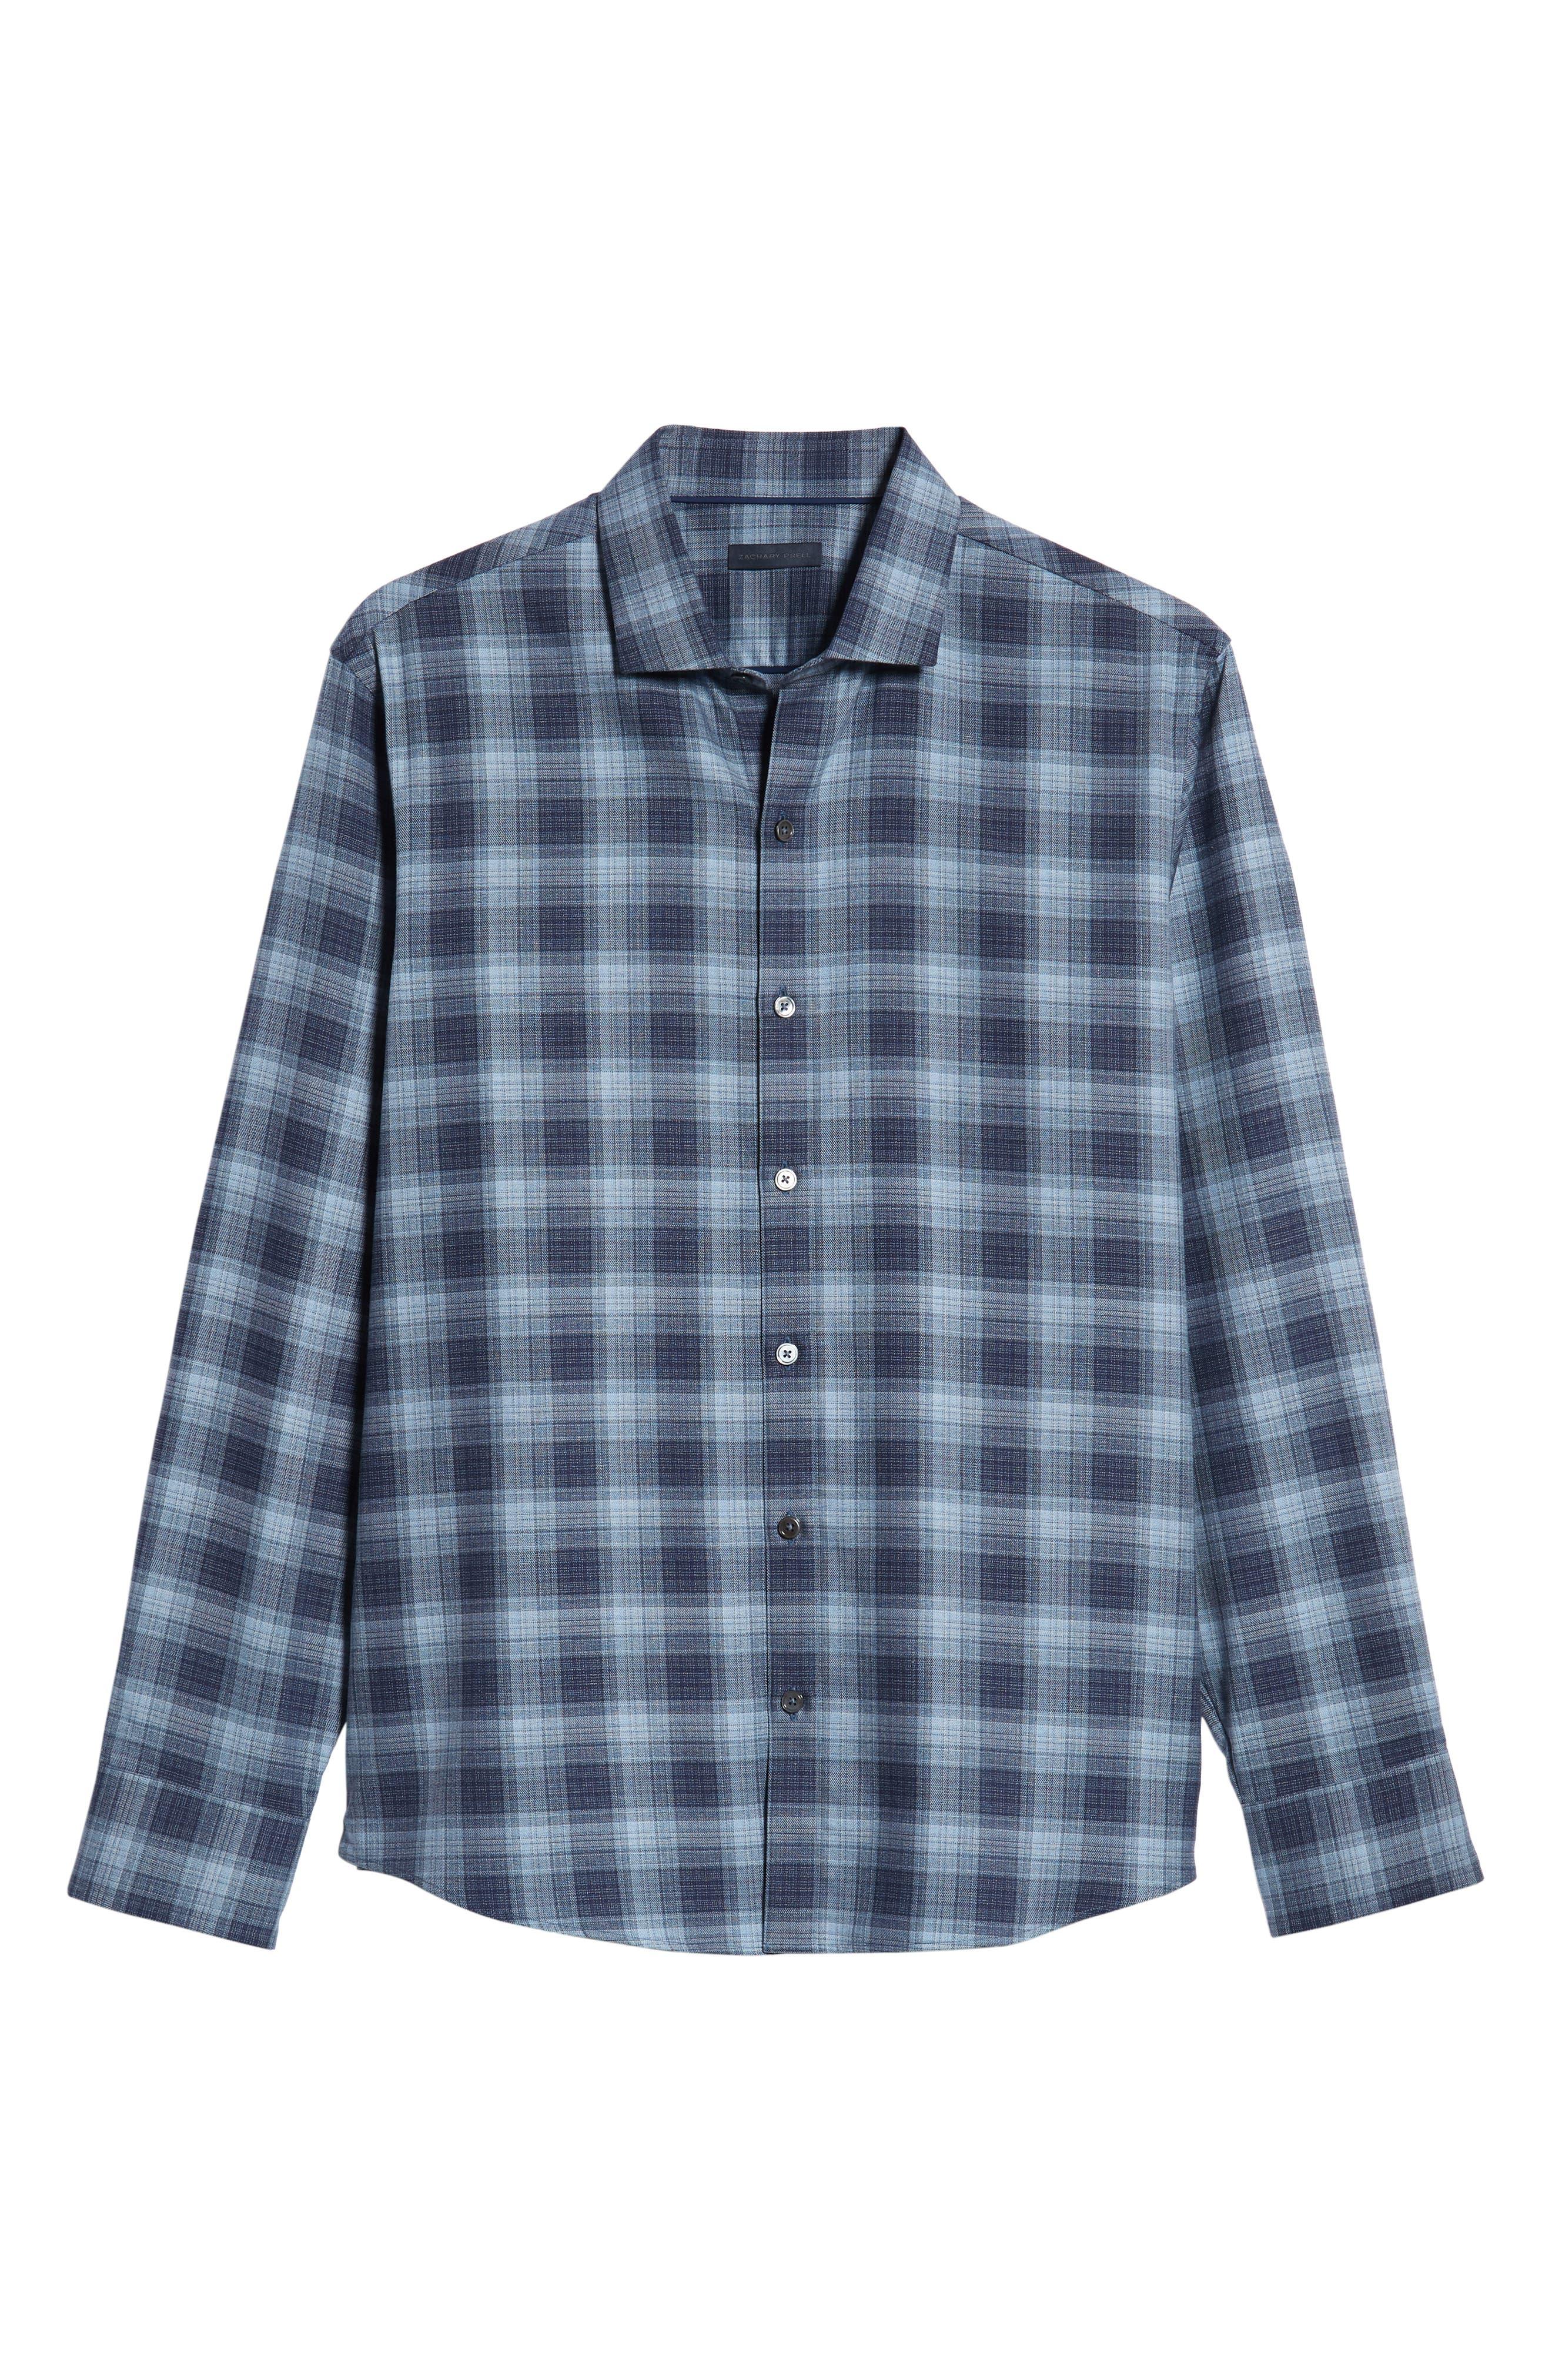 Oris Regular Fit Check Sport Shirt,                             Alternate thumbnail 5, color,                             BLUE